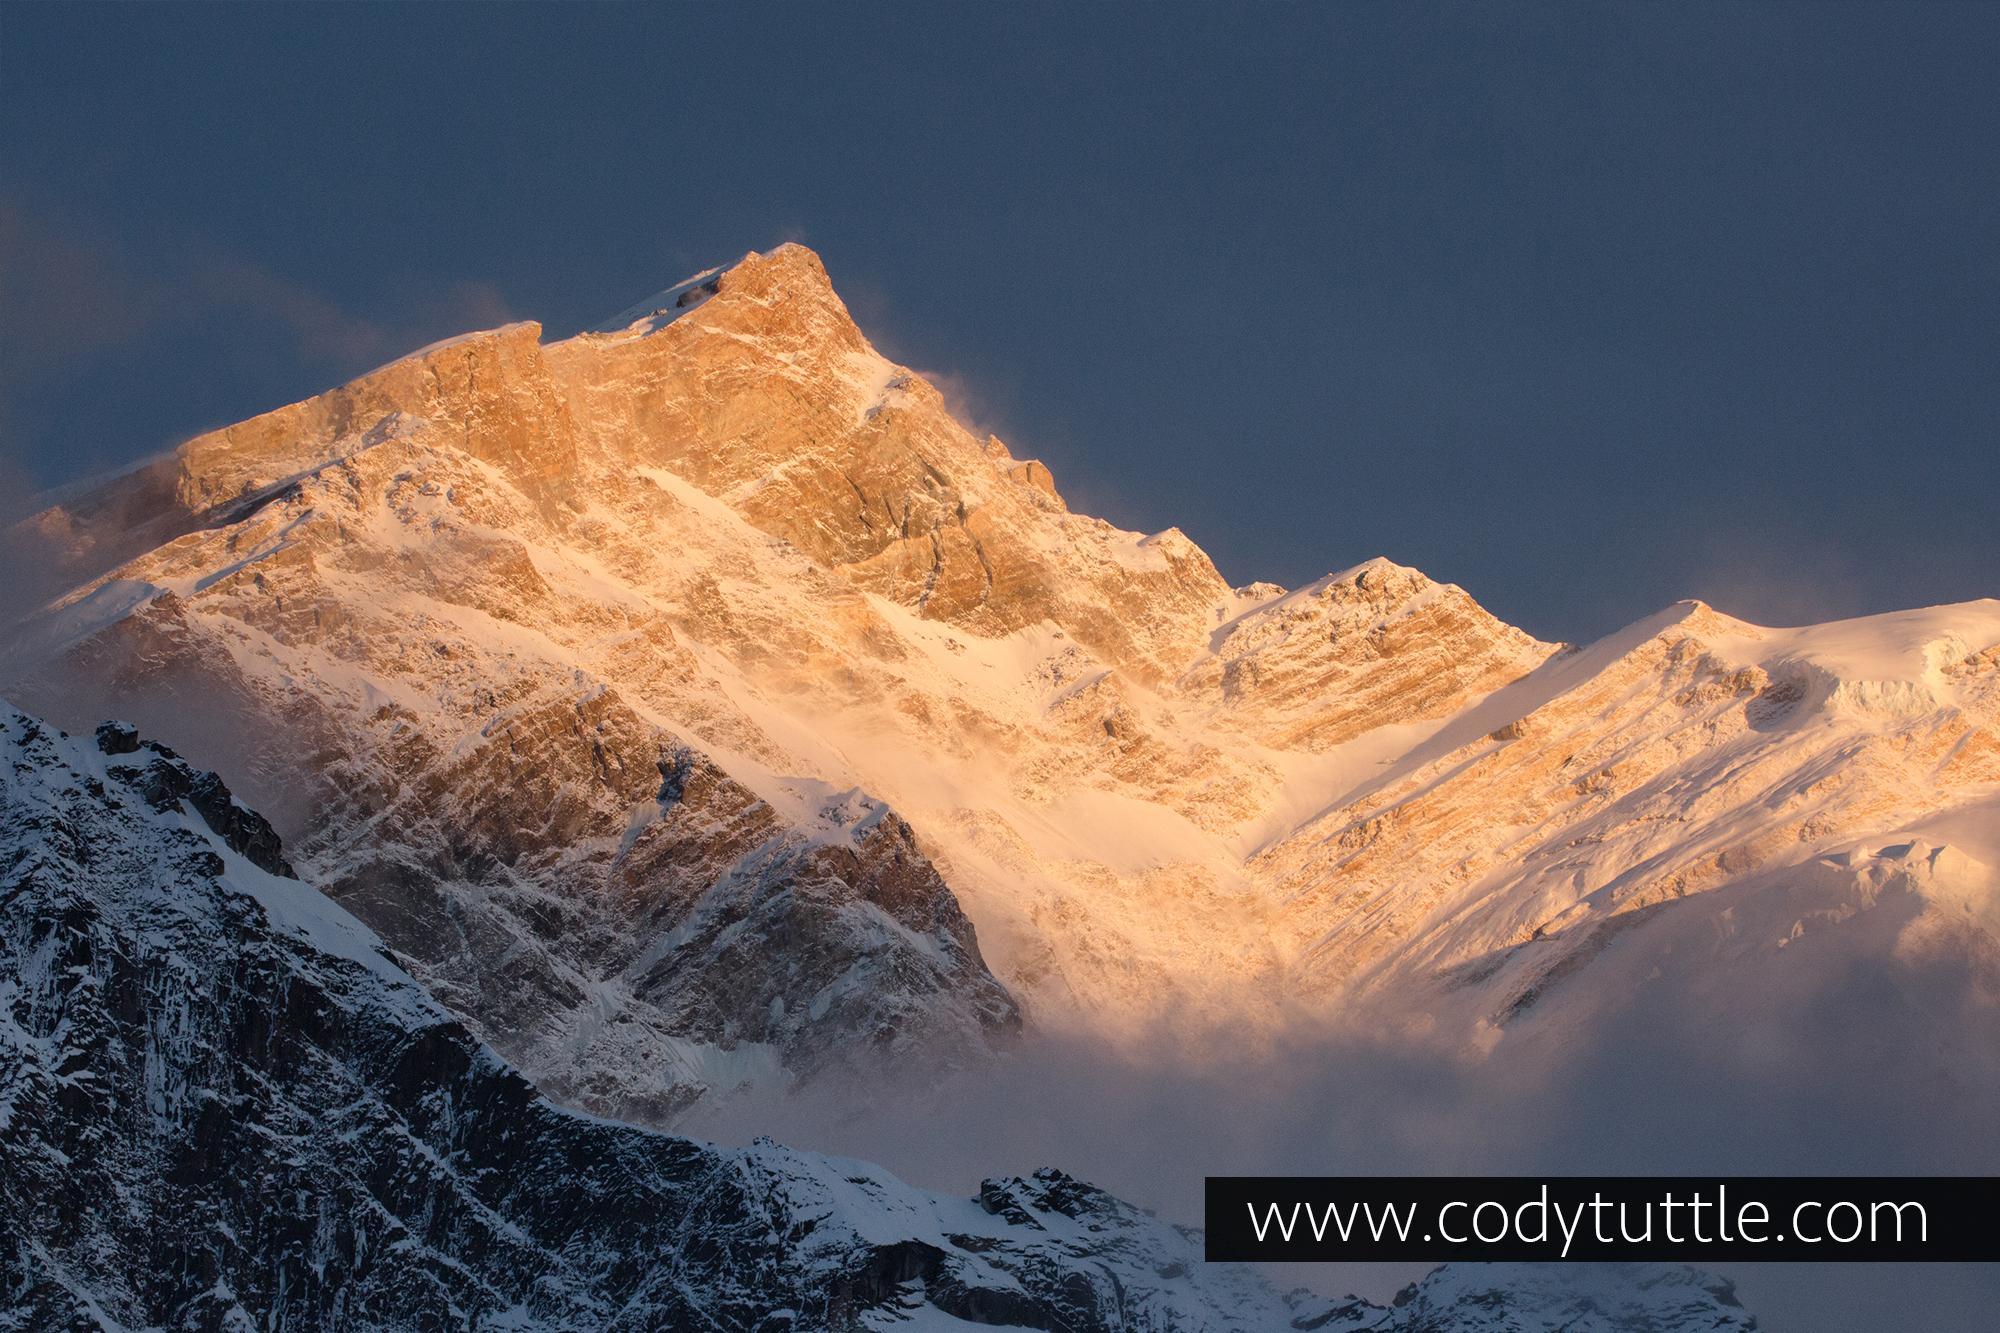 Annapurna I North Face 26,545 ft Nepal